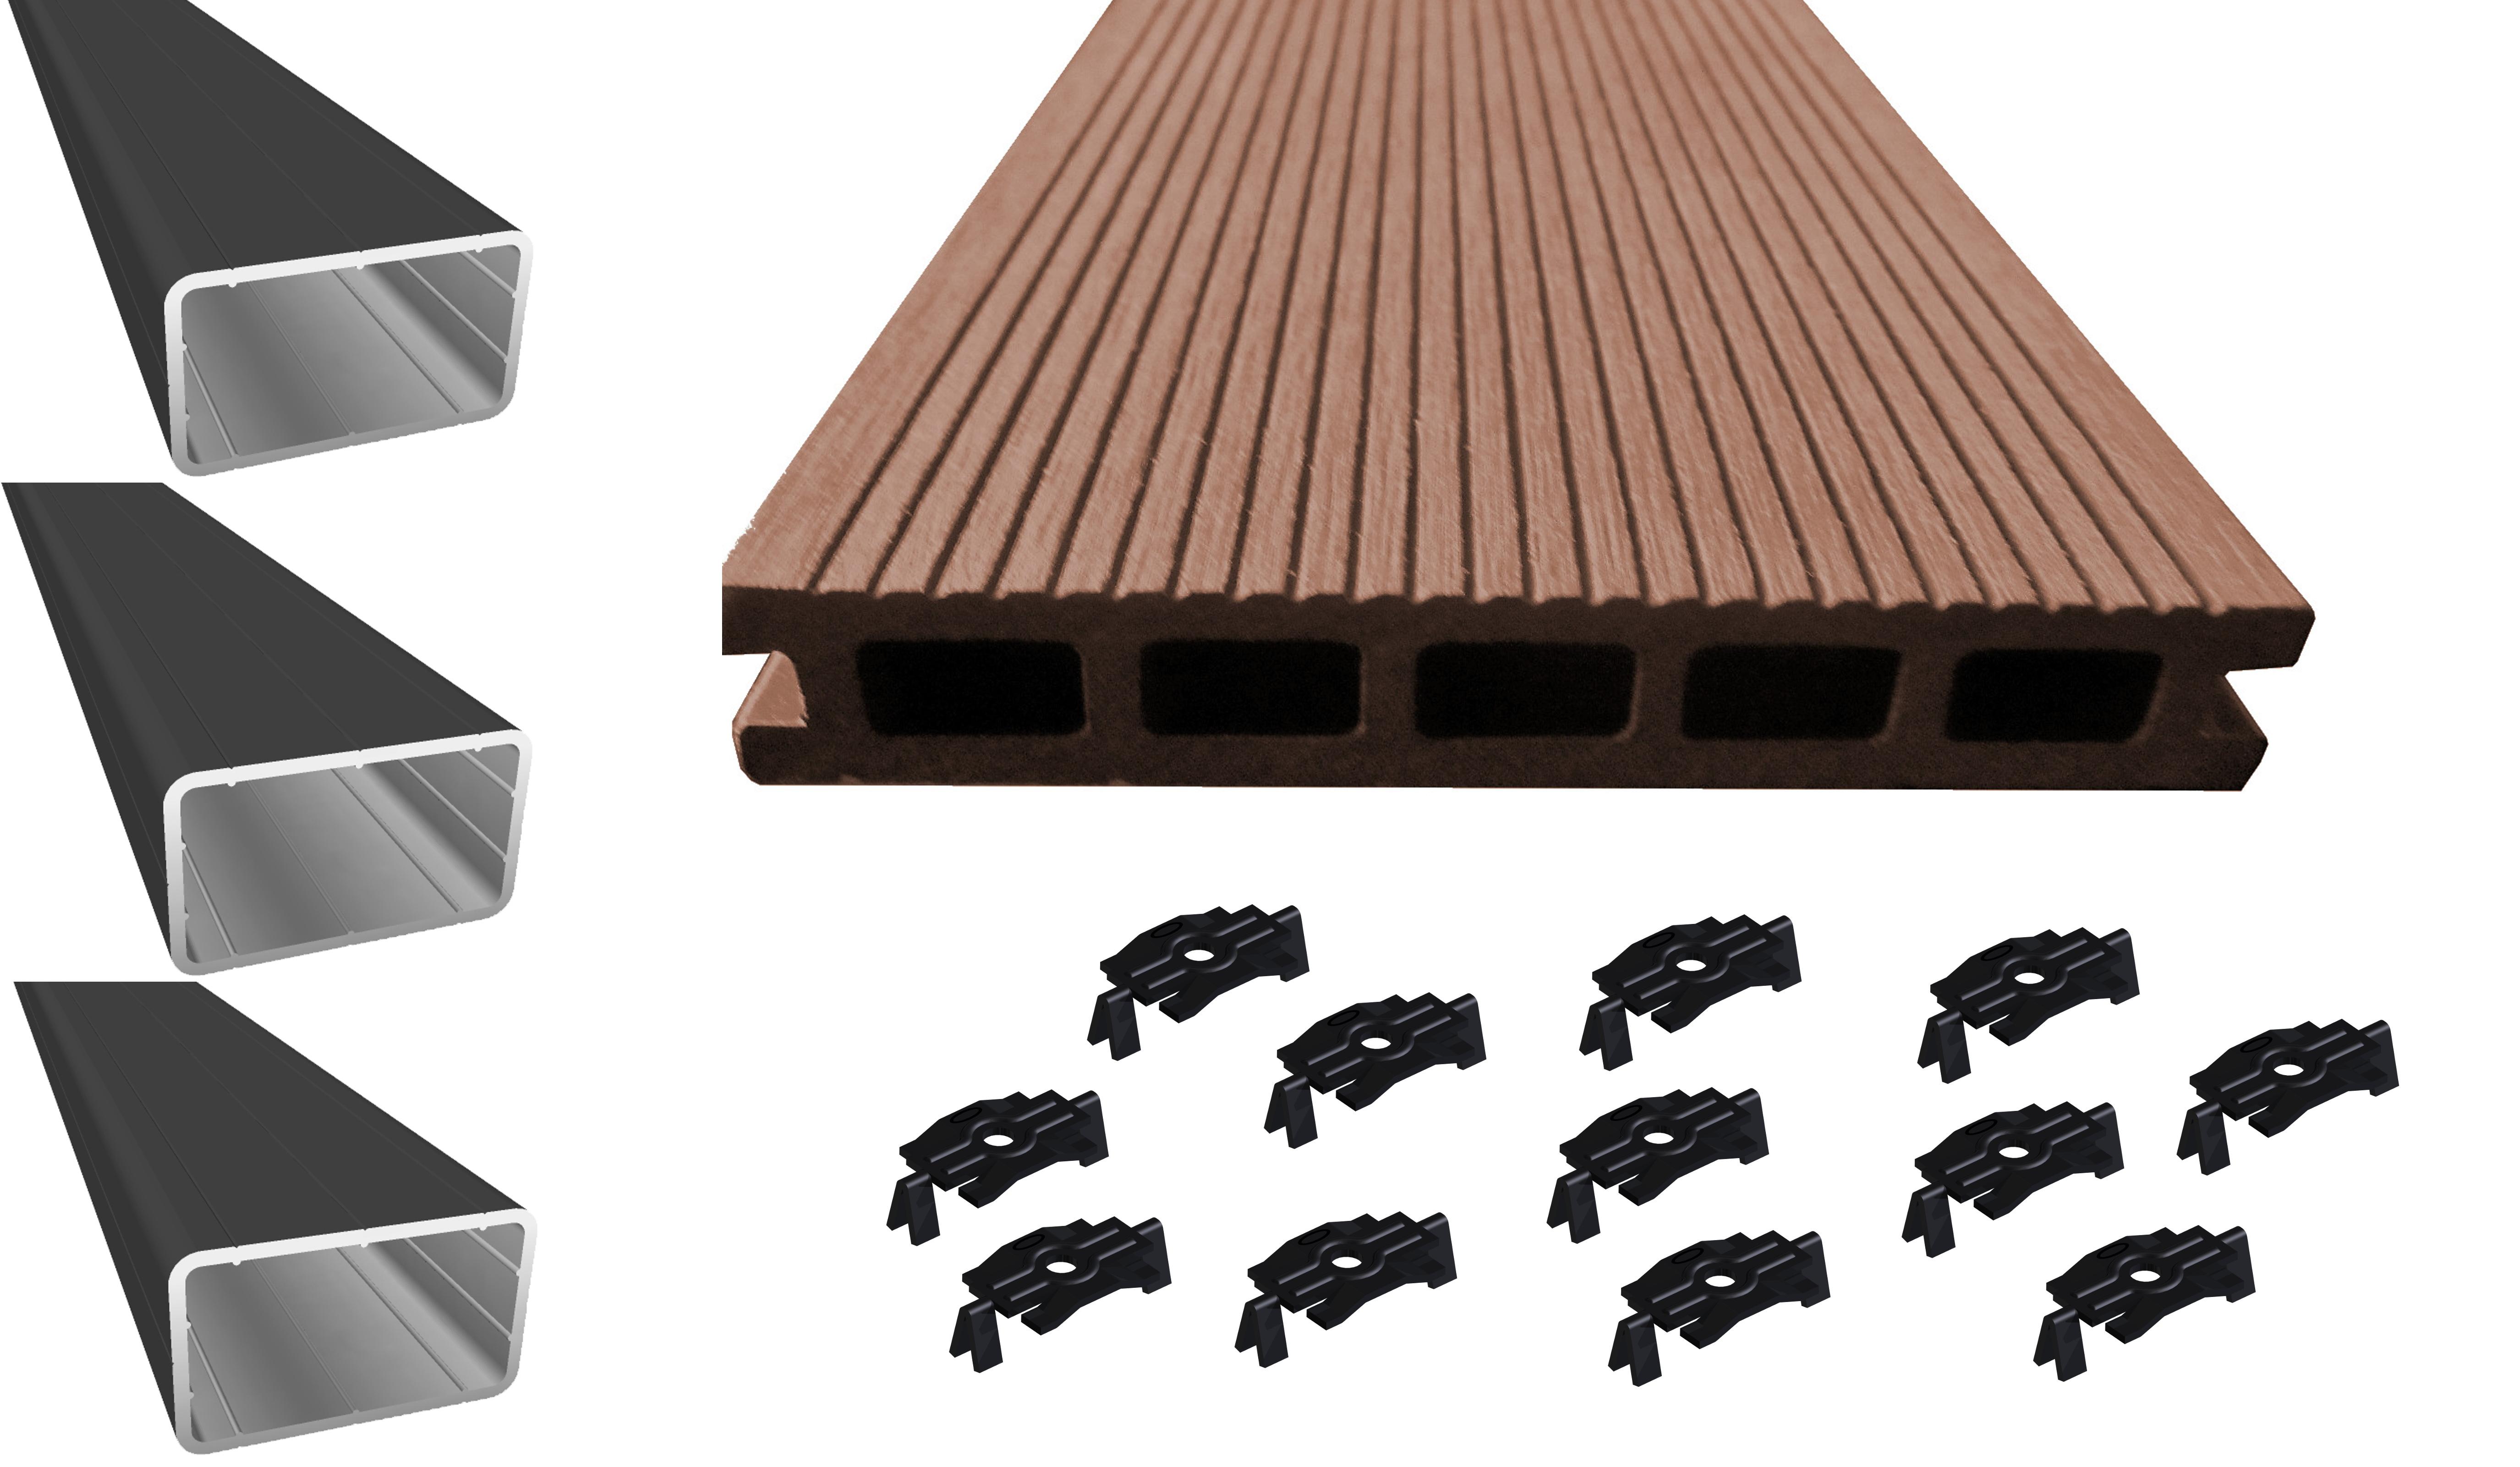 beste terrassendielen verlegen design ideen terrasse design ideen. Black Bedroom Furniture Sets. Home Design Ideas